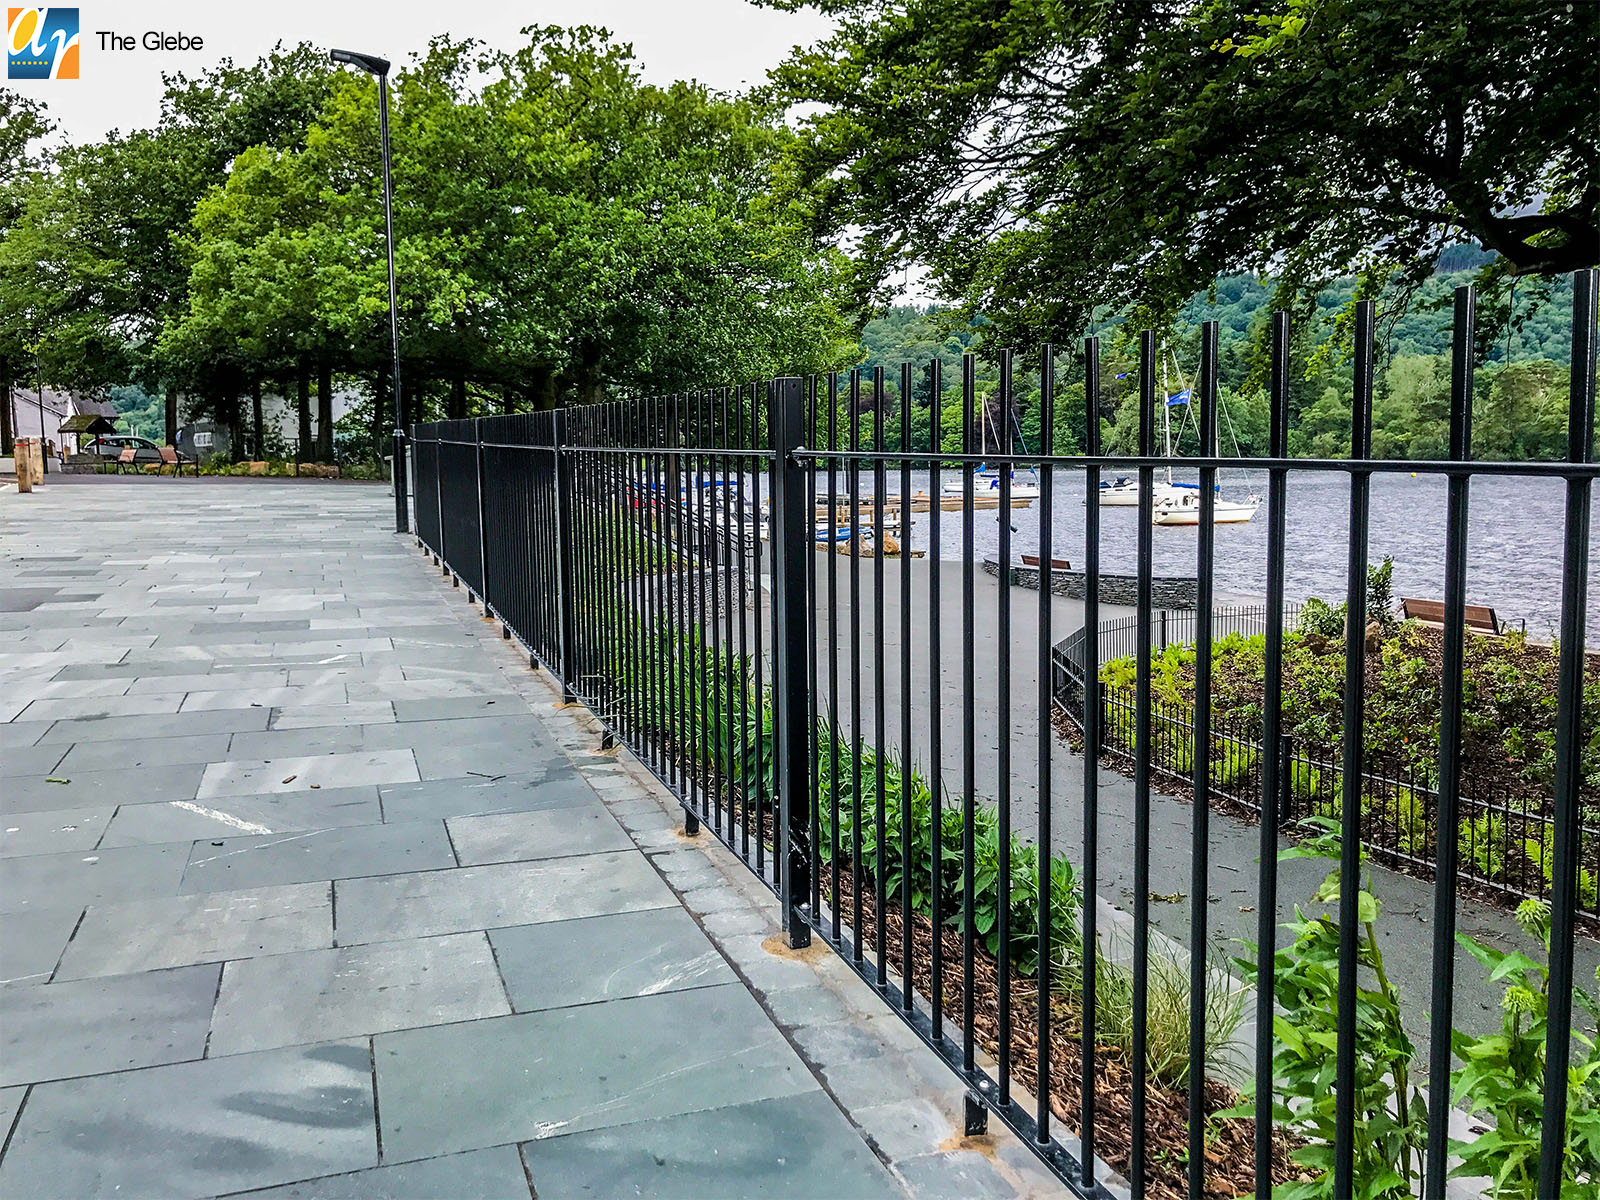 Standard Vertical Bar railings, The Glebe